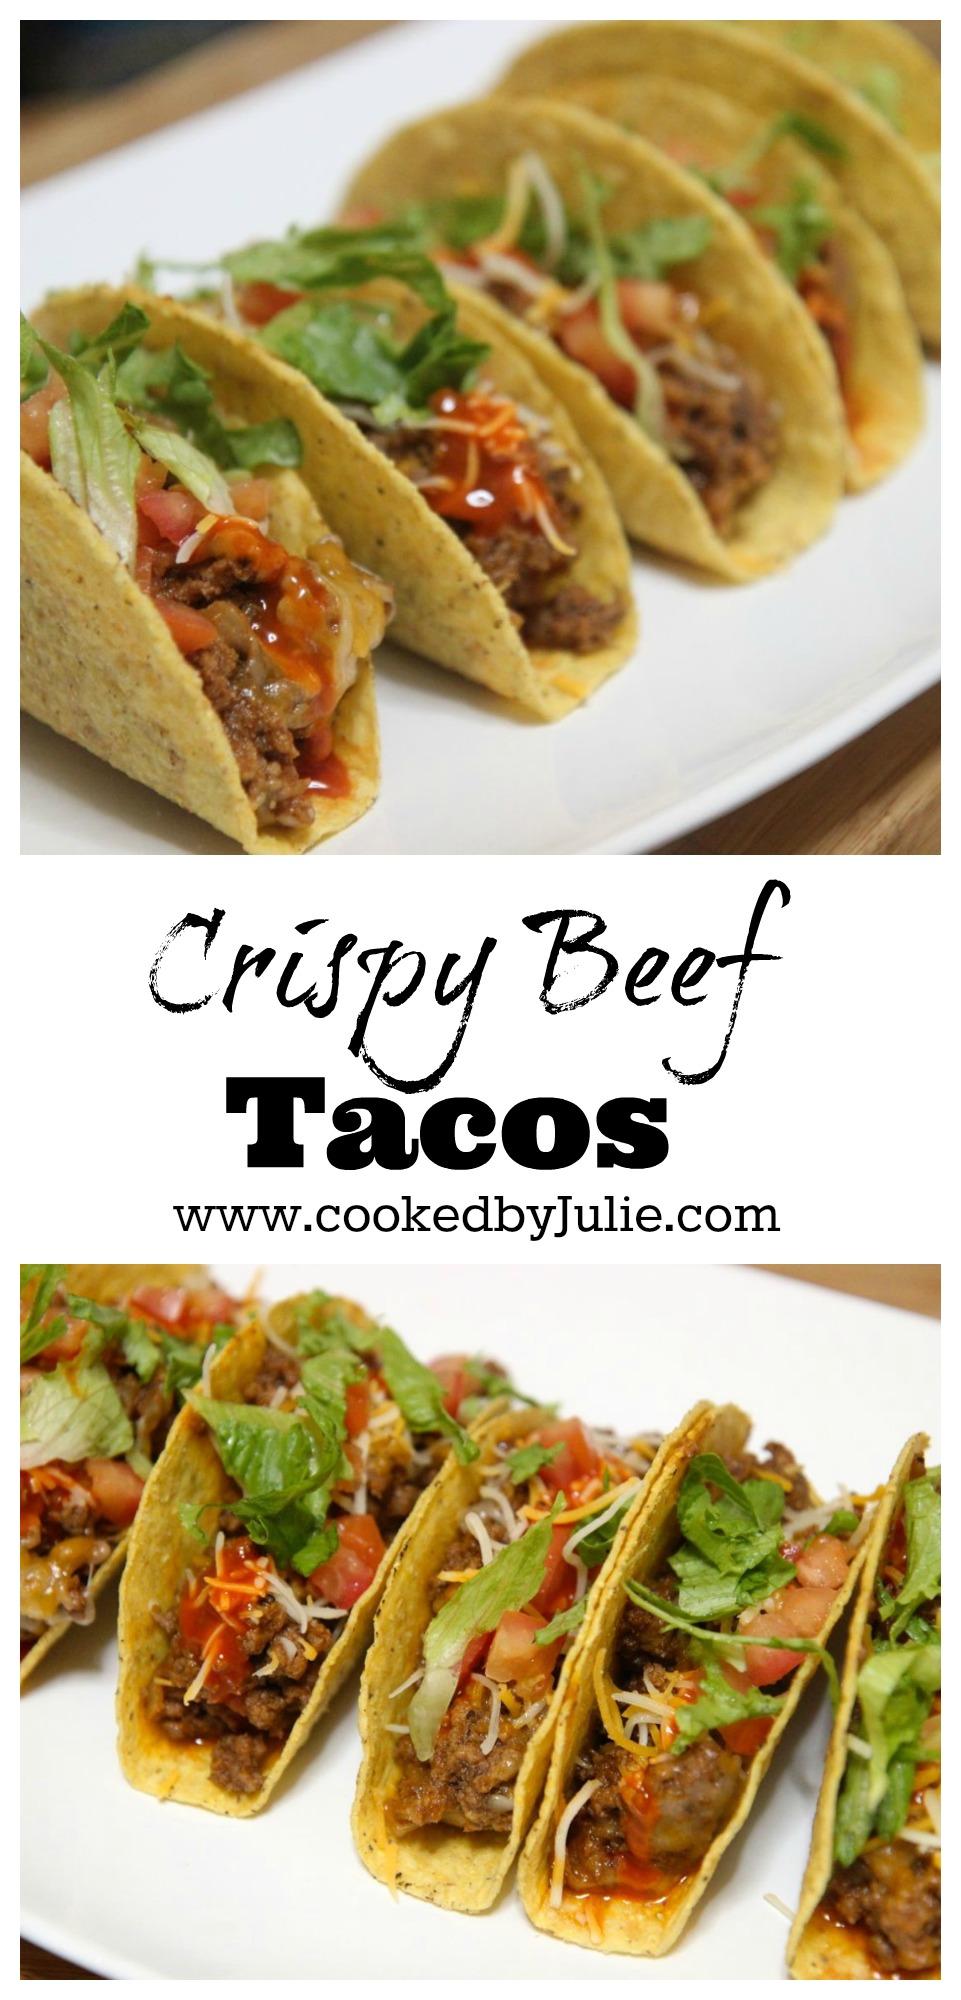 Crispy Beef Tacos | Easy Taco Night Recipe | Homemade Tacos